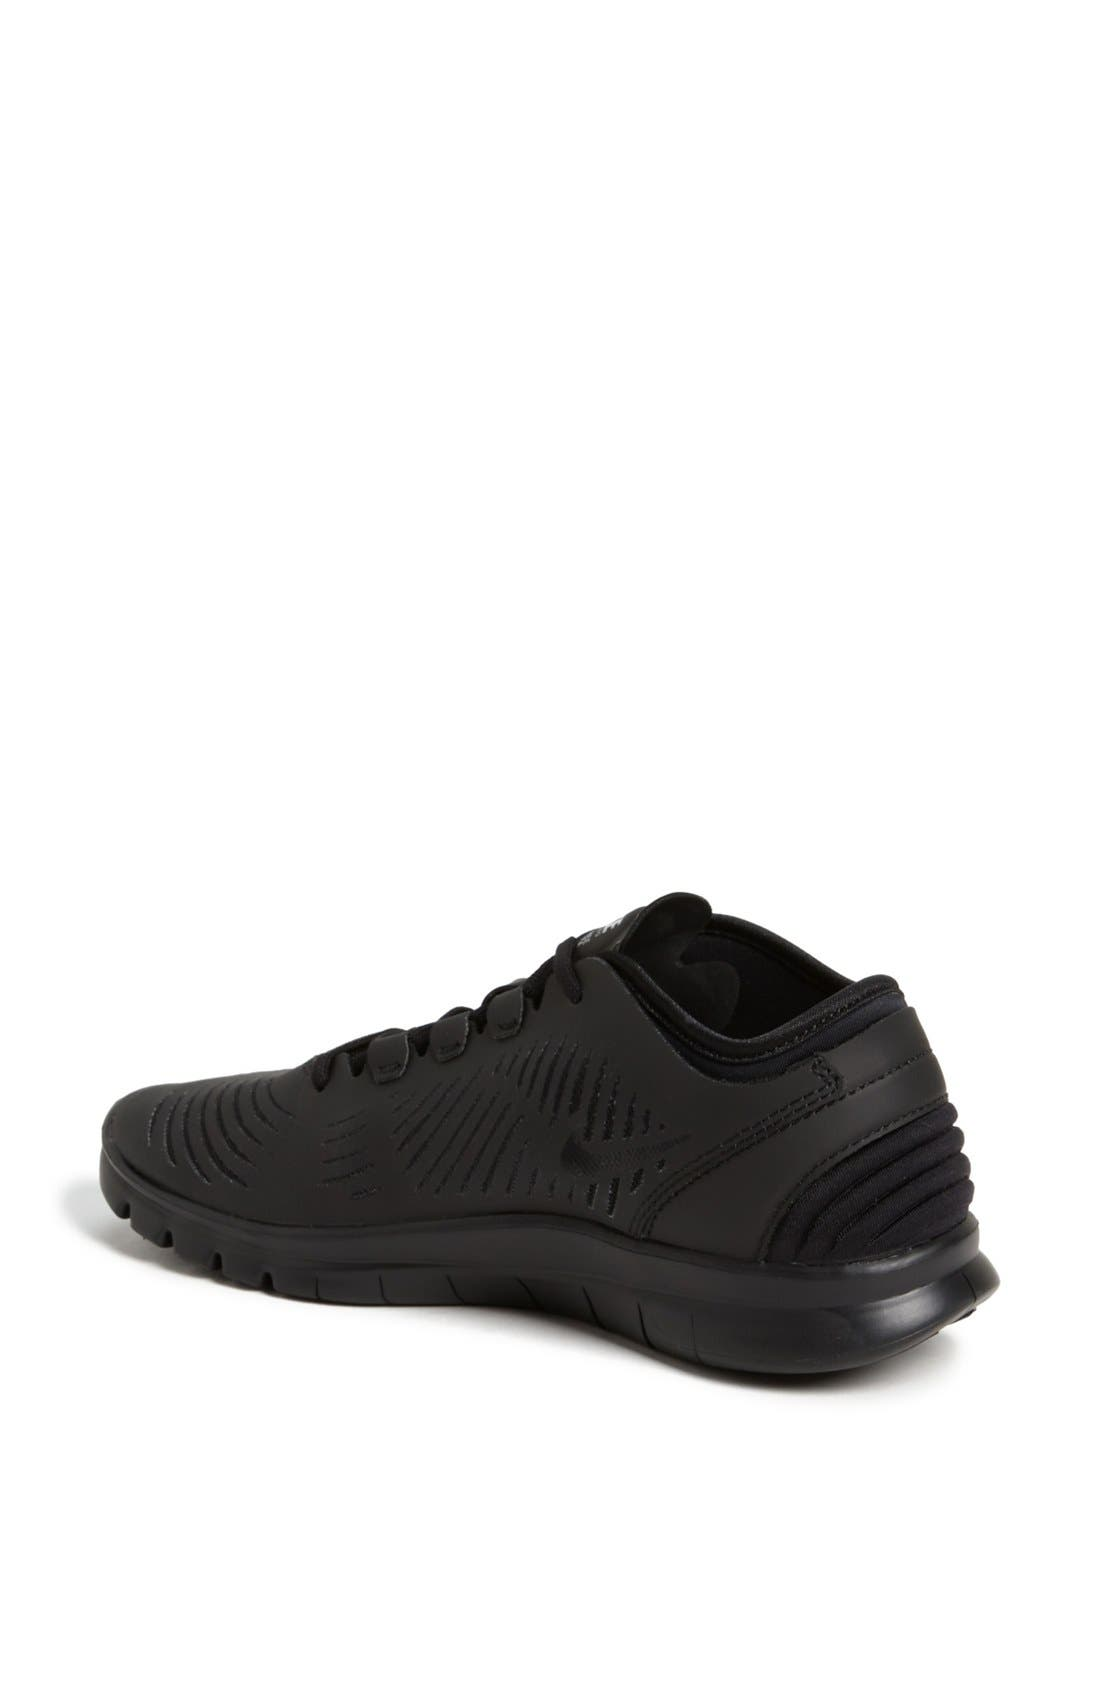 reputable site 2fbf4 dd28f ... get official nike free balanza training shoe women nordstrom 265fc  0ac6e 782de 86e74